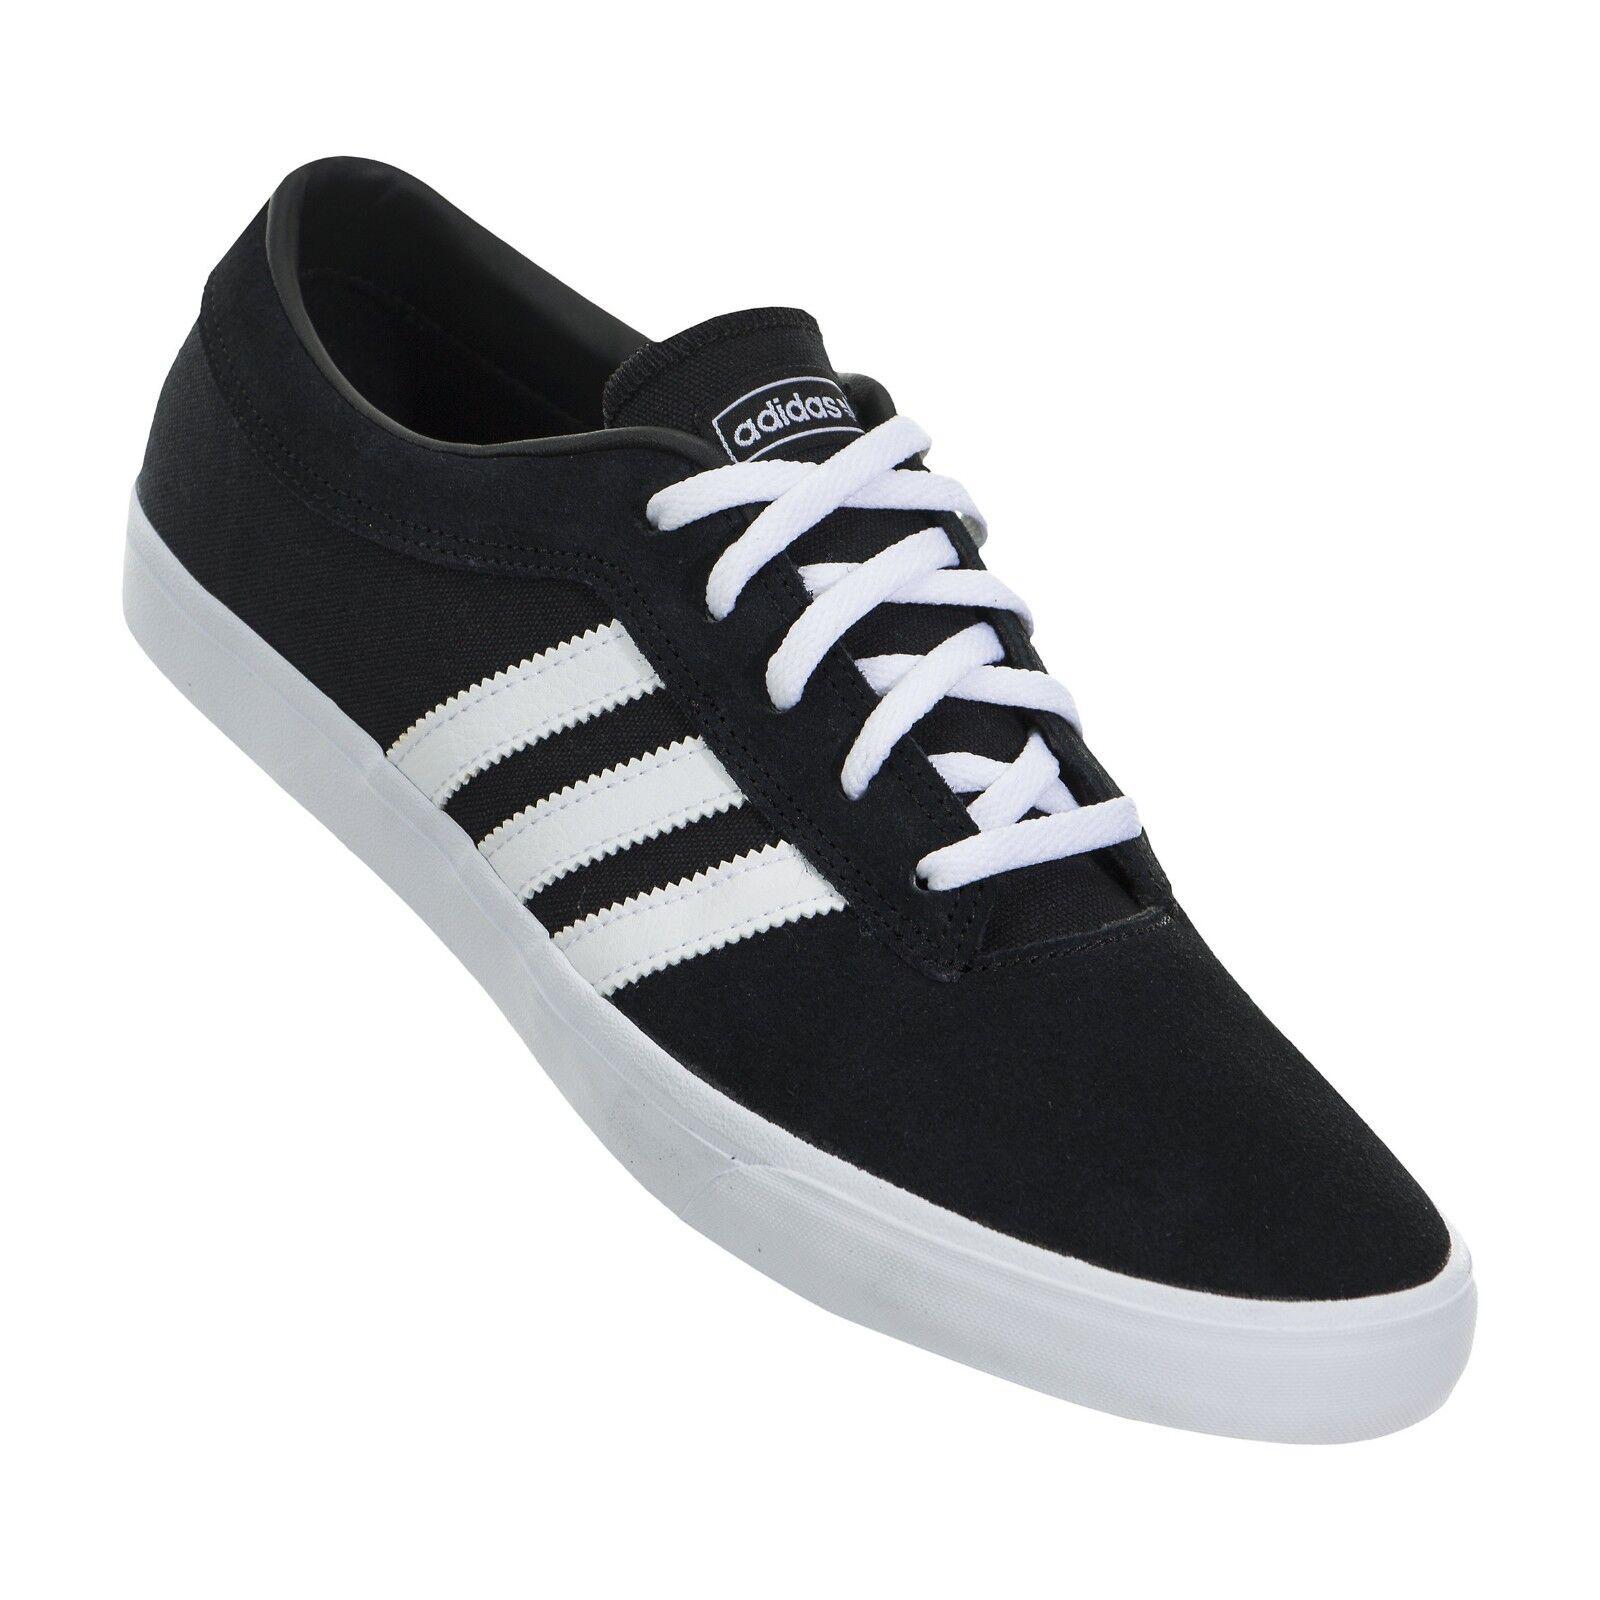 Adidas Originals Sellwood Tenis Tenis Tenis Negro/Blanco bec76a